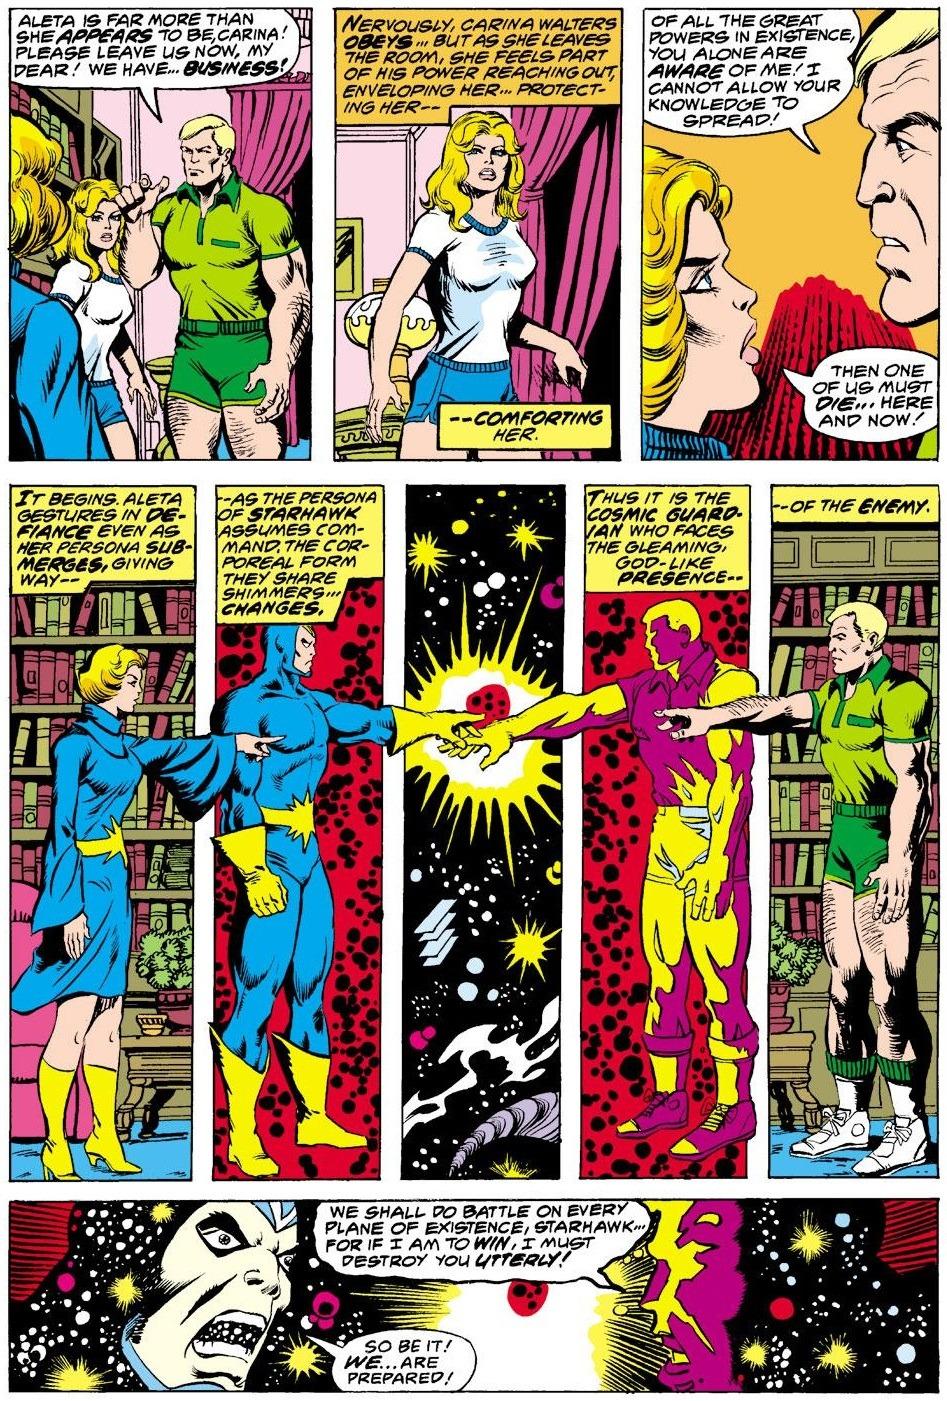 Image result for The Avengers #168 starhawk aleta